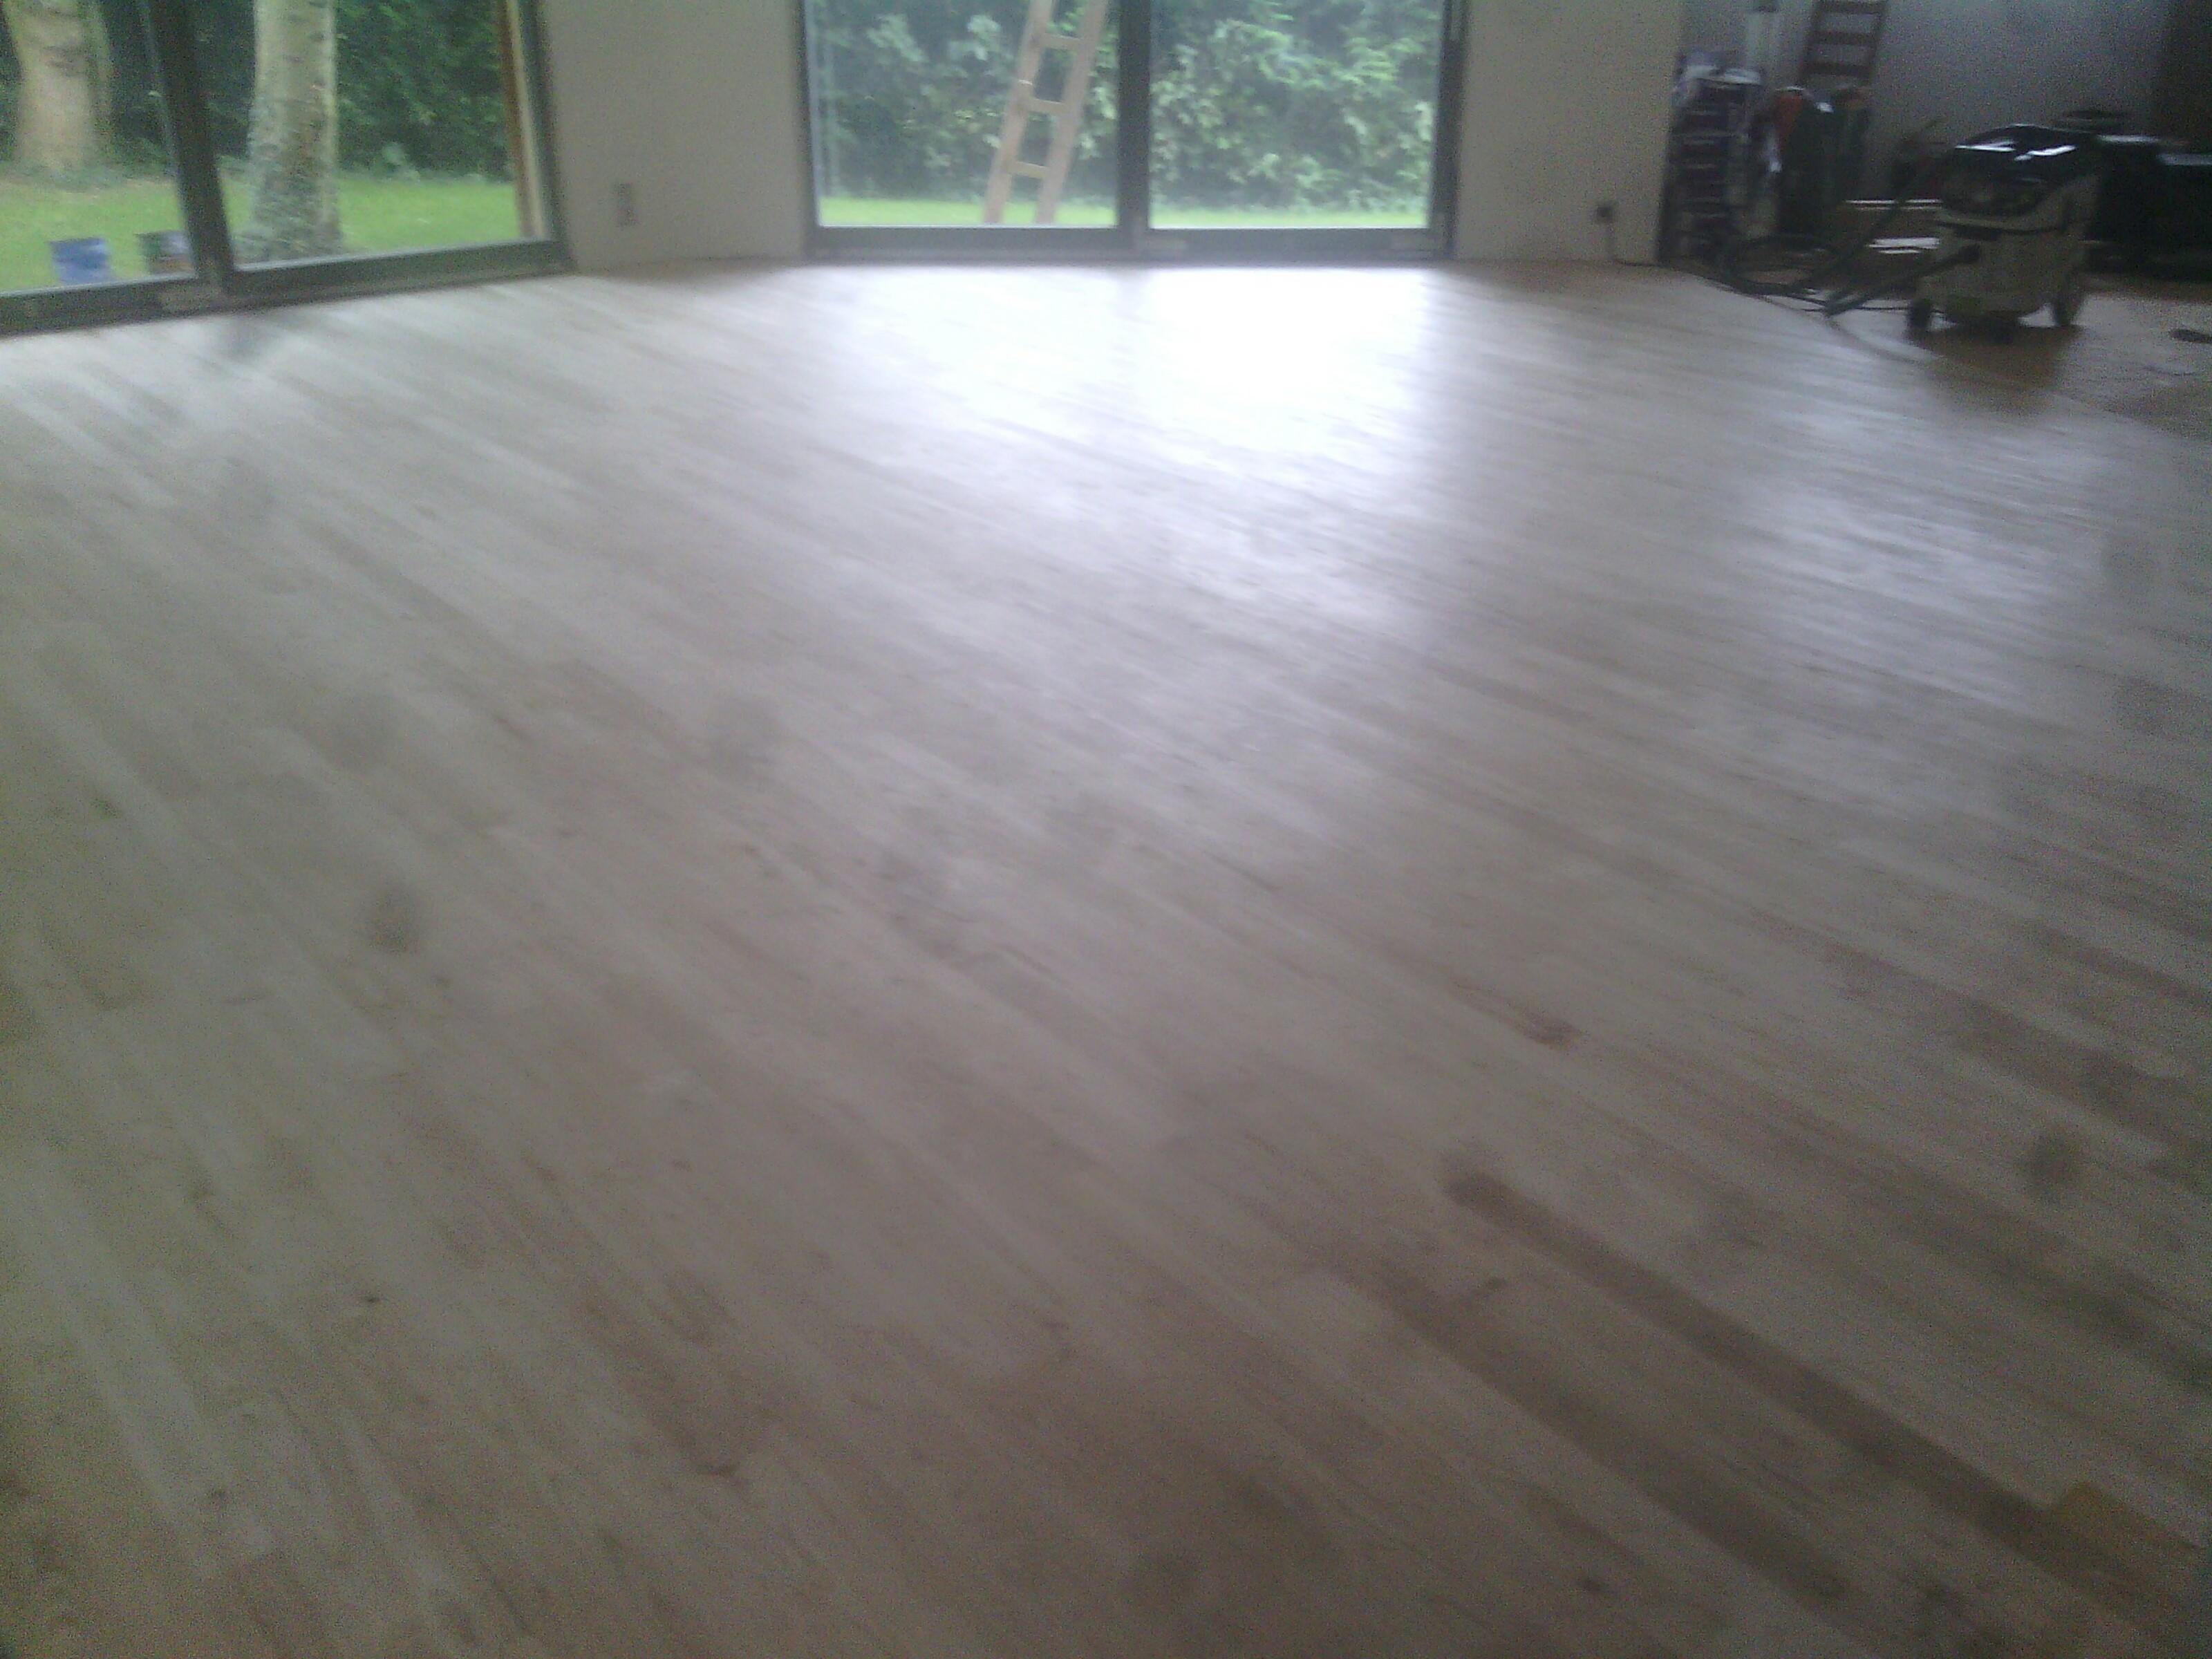 80300 Grandcourt : Pose plancher chauffant RT2020t - finition parquet